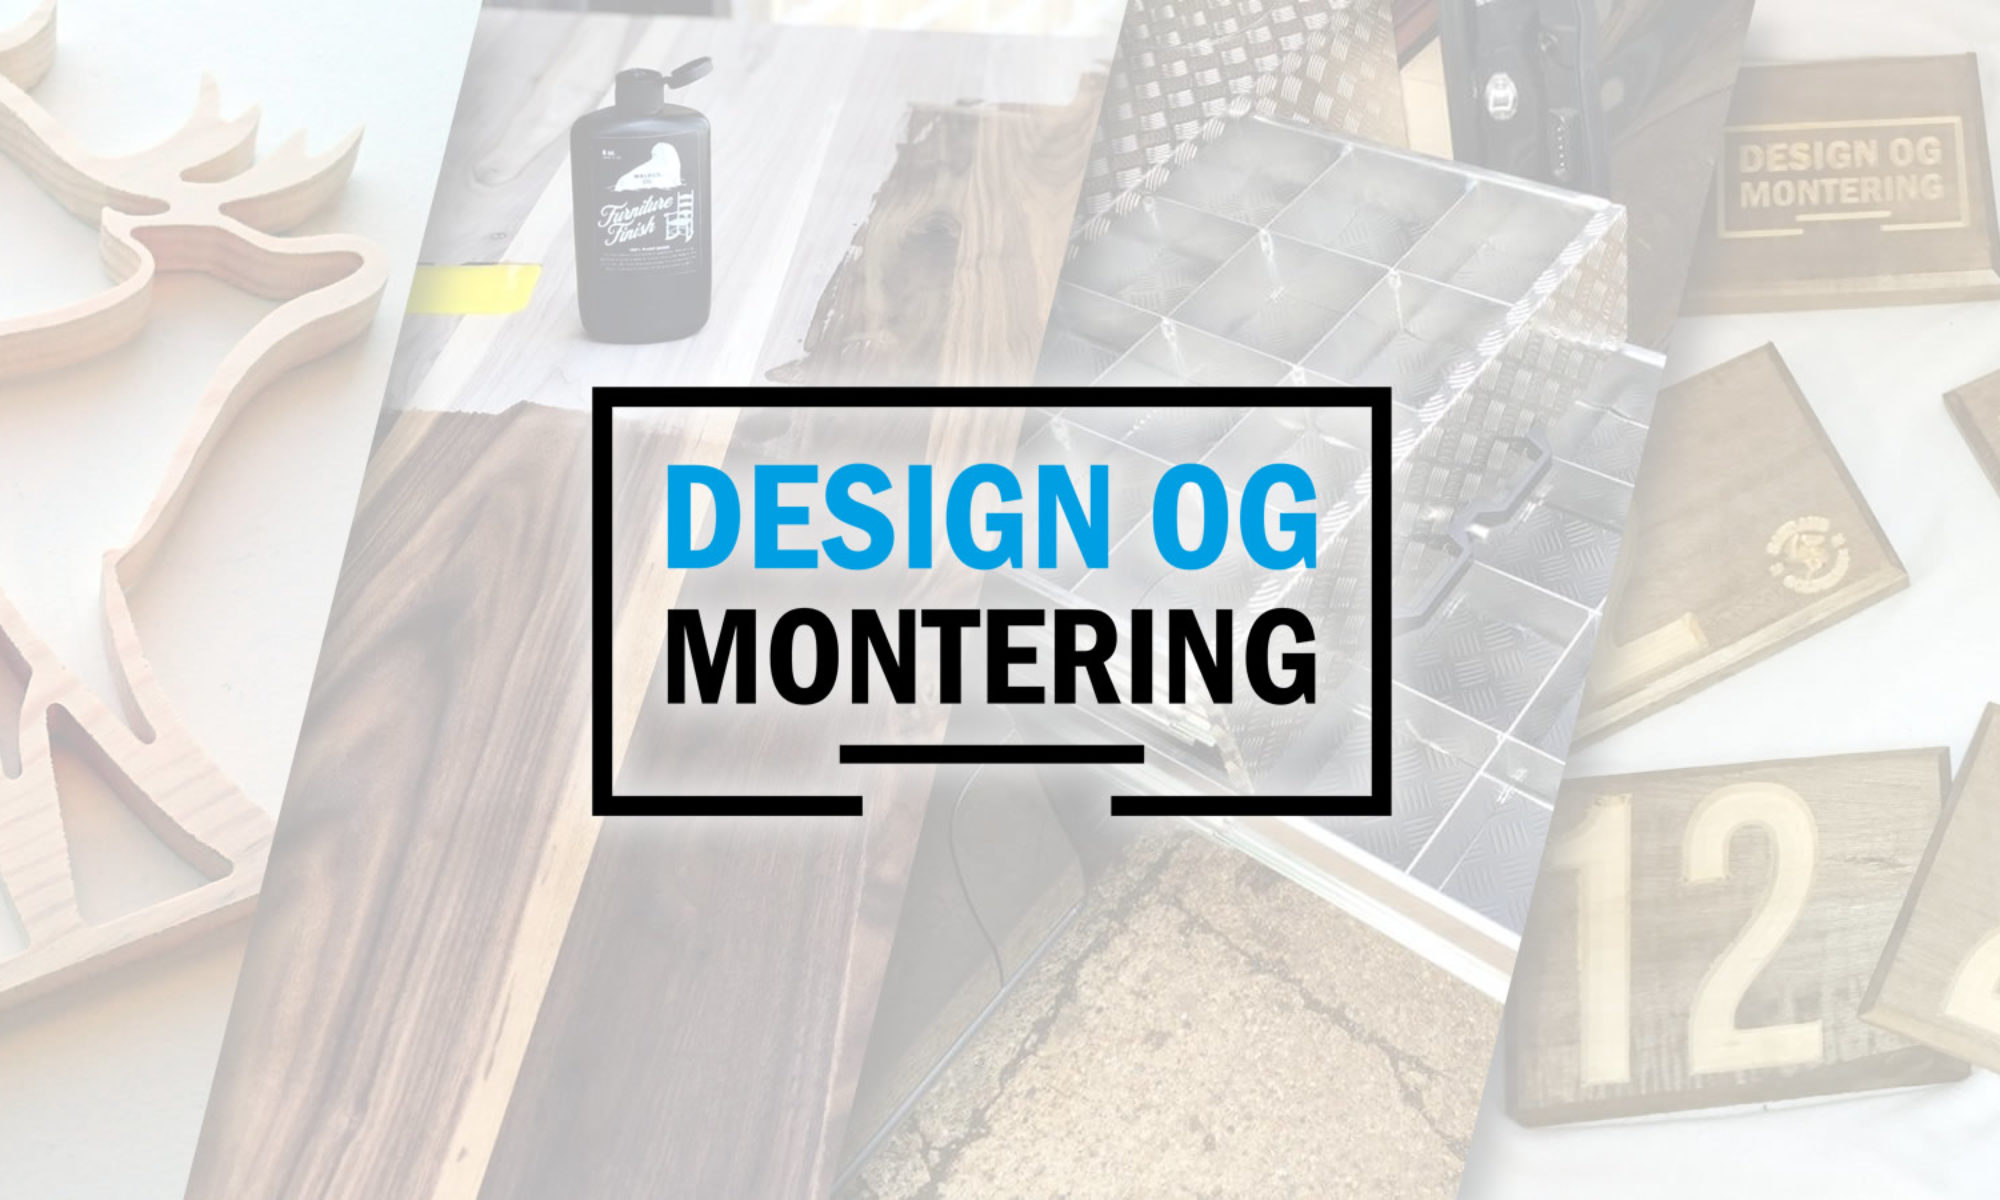 Design og Montering